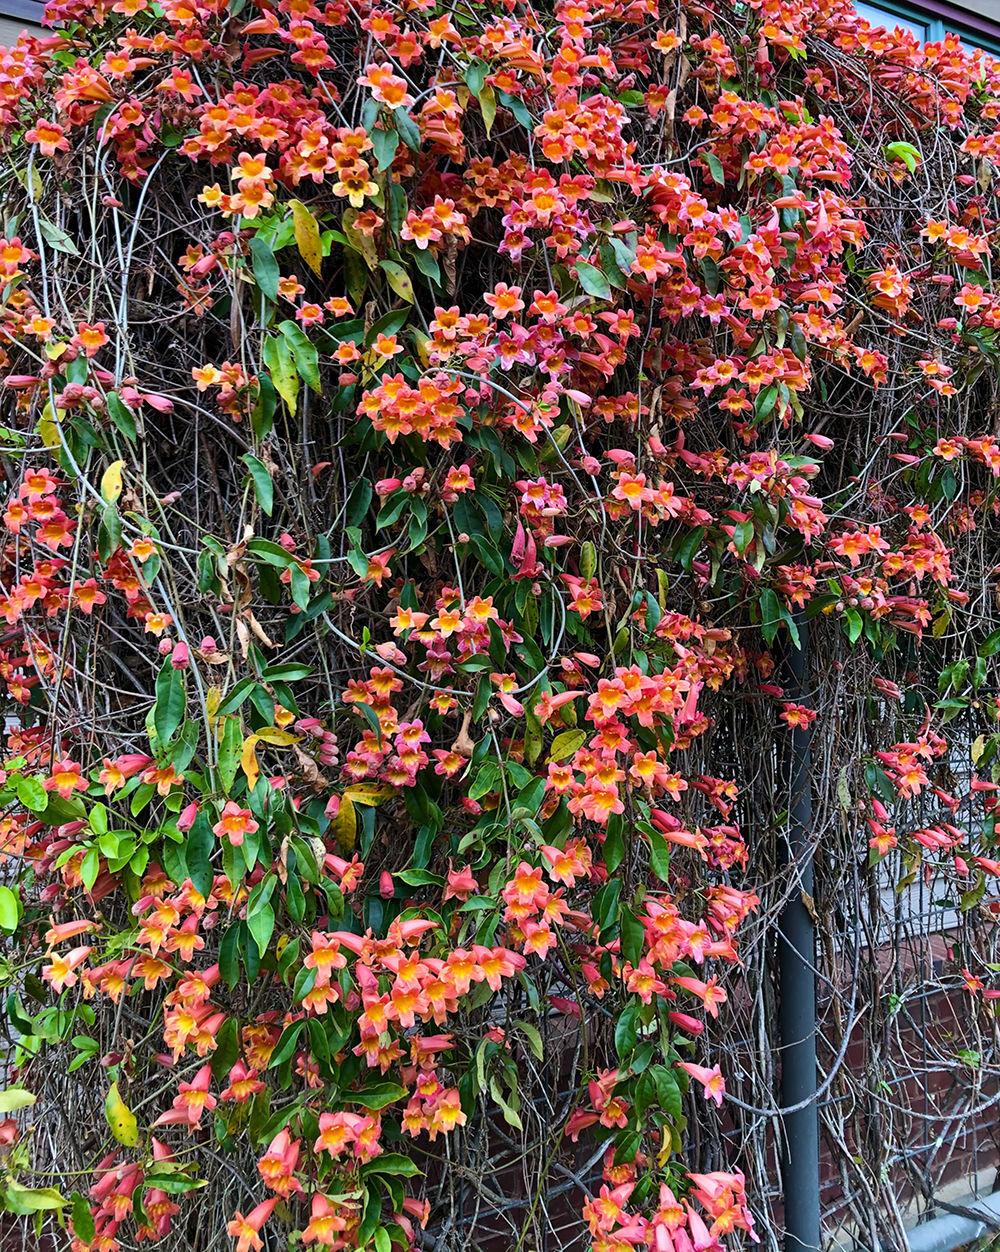 8 Crossvine, Tangerine Beauty at History Center by Jonathan Gerland.jpg